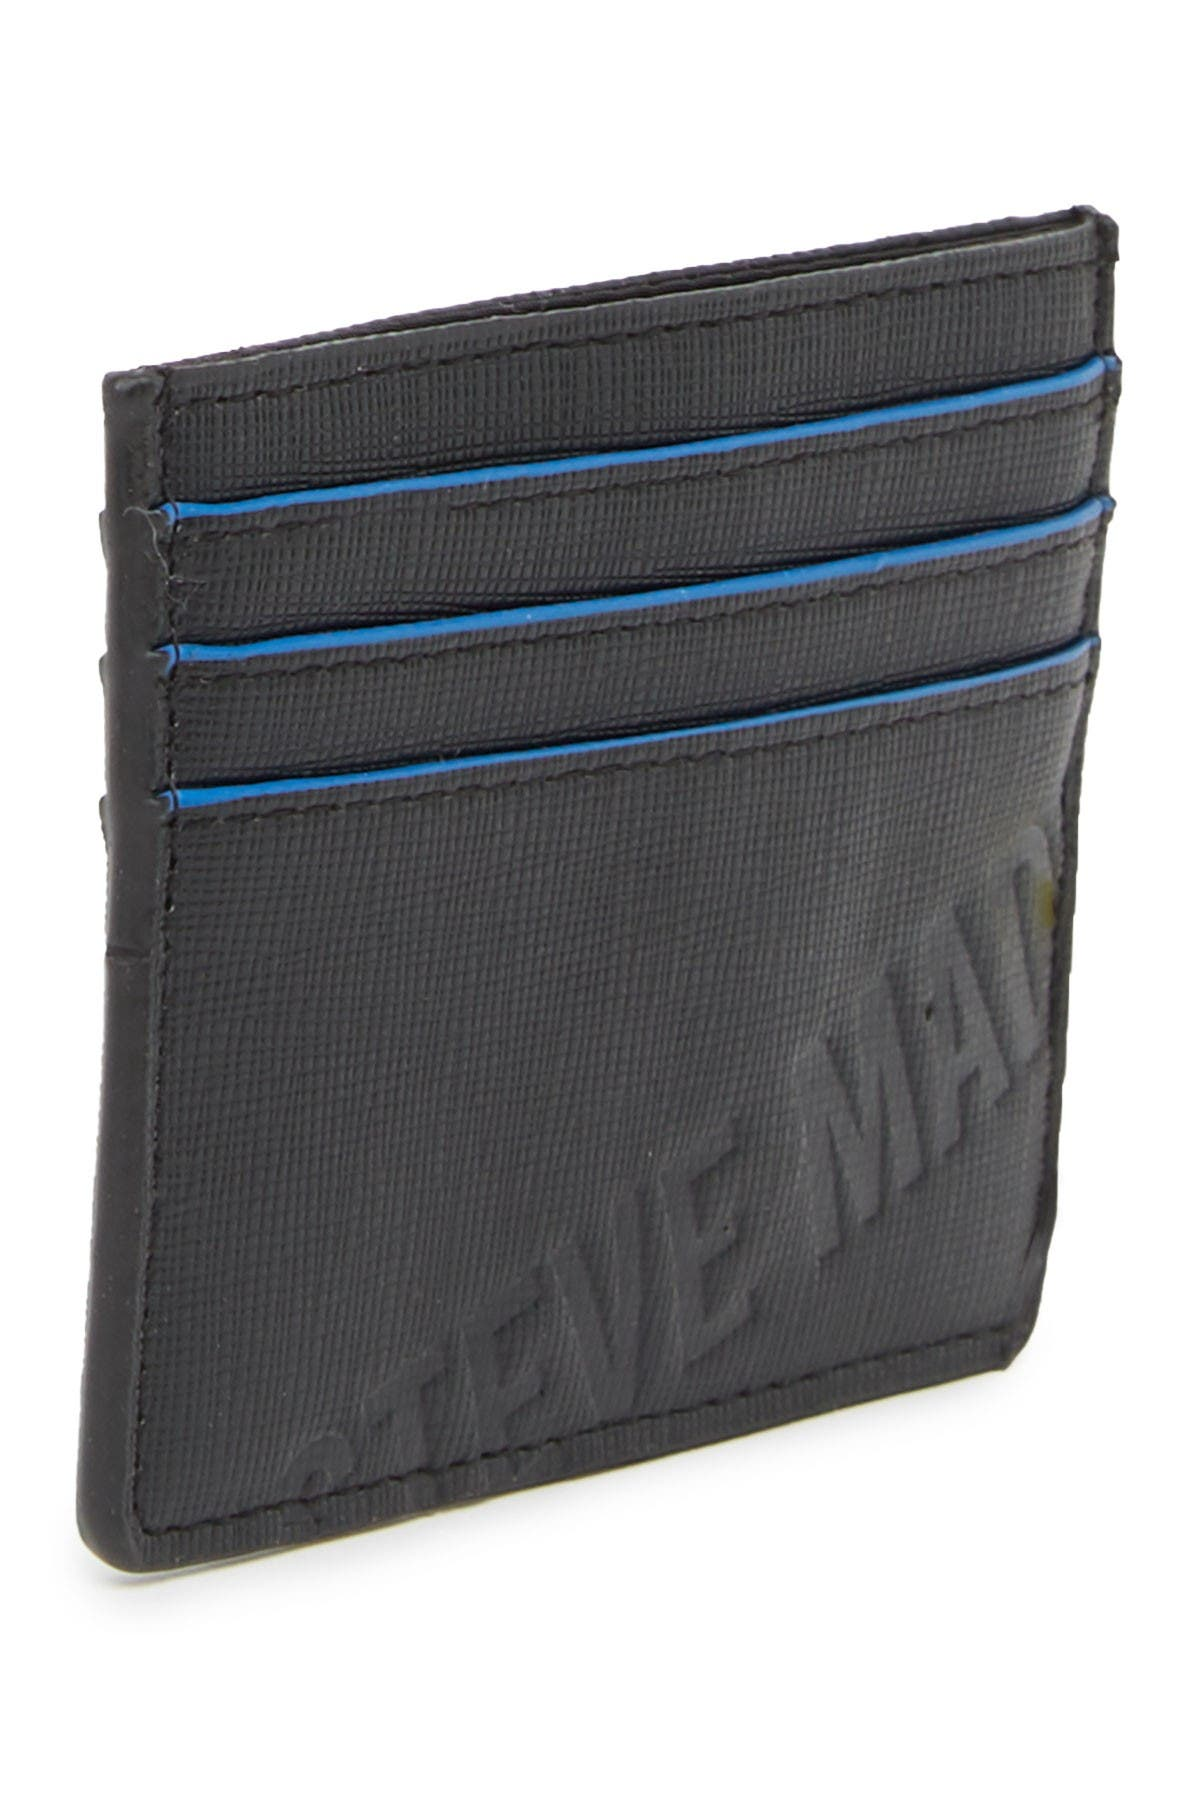 Steve Madden Leather Card Case